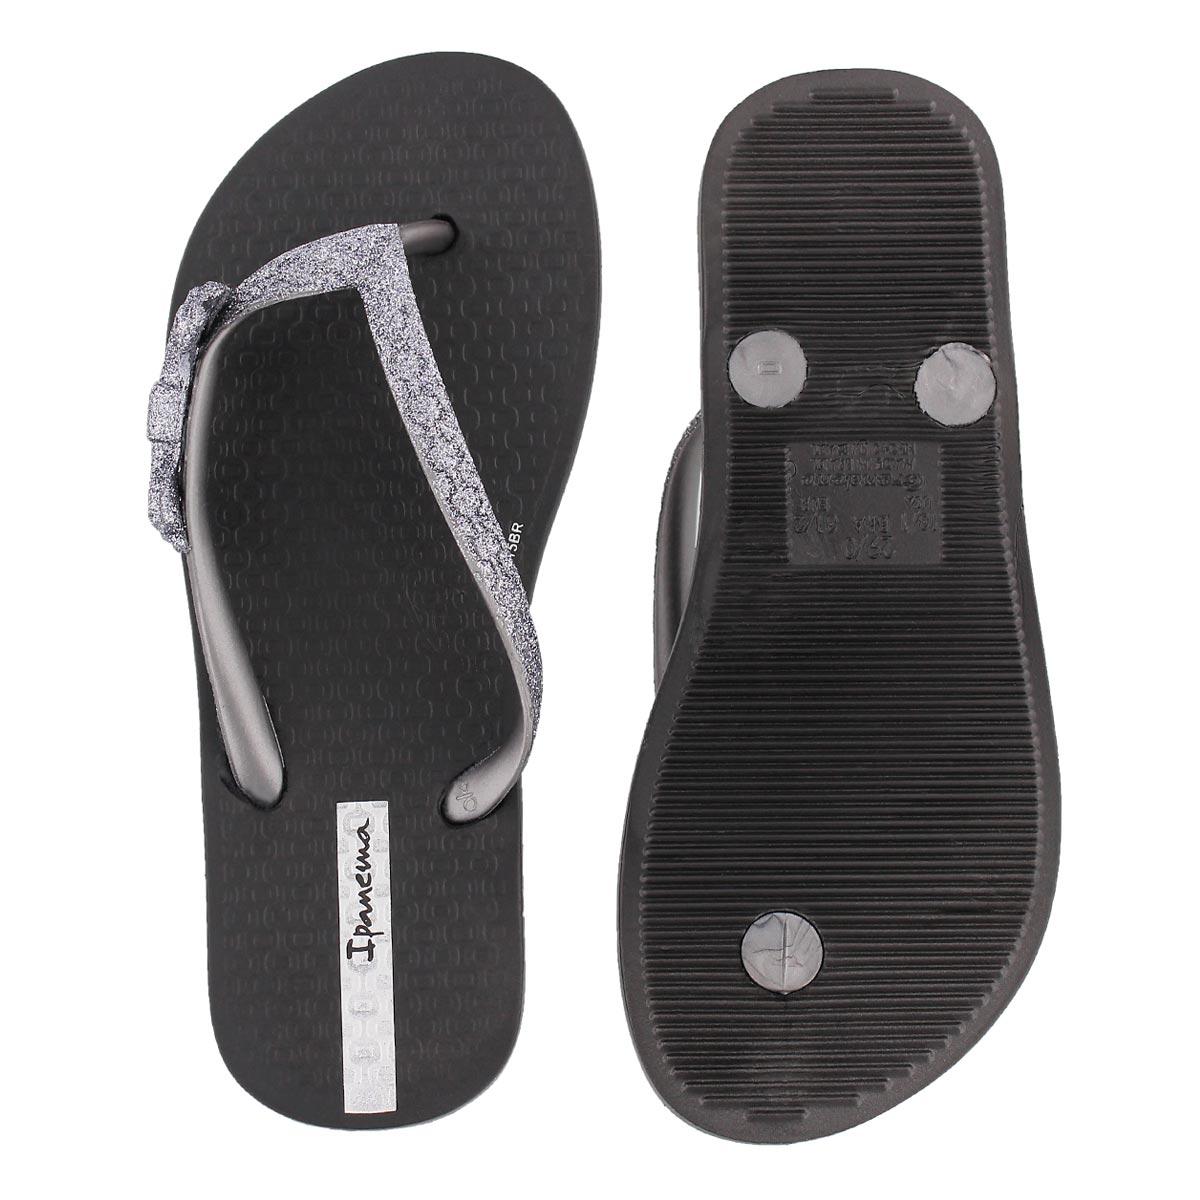 Sandale tong LOLITA III, noir, filles